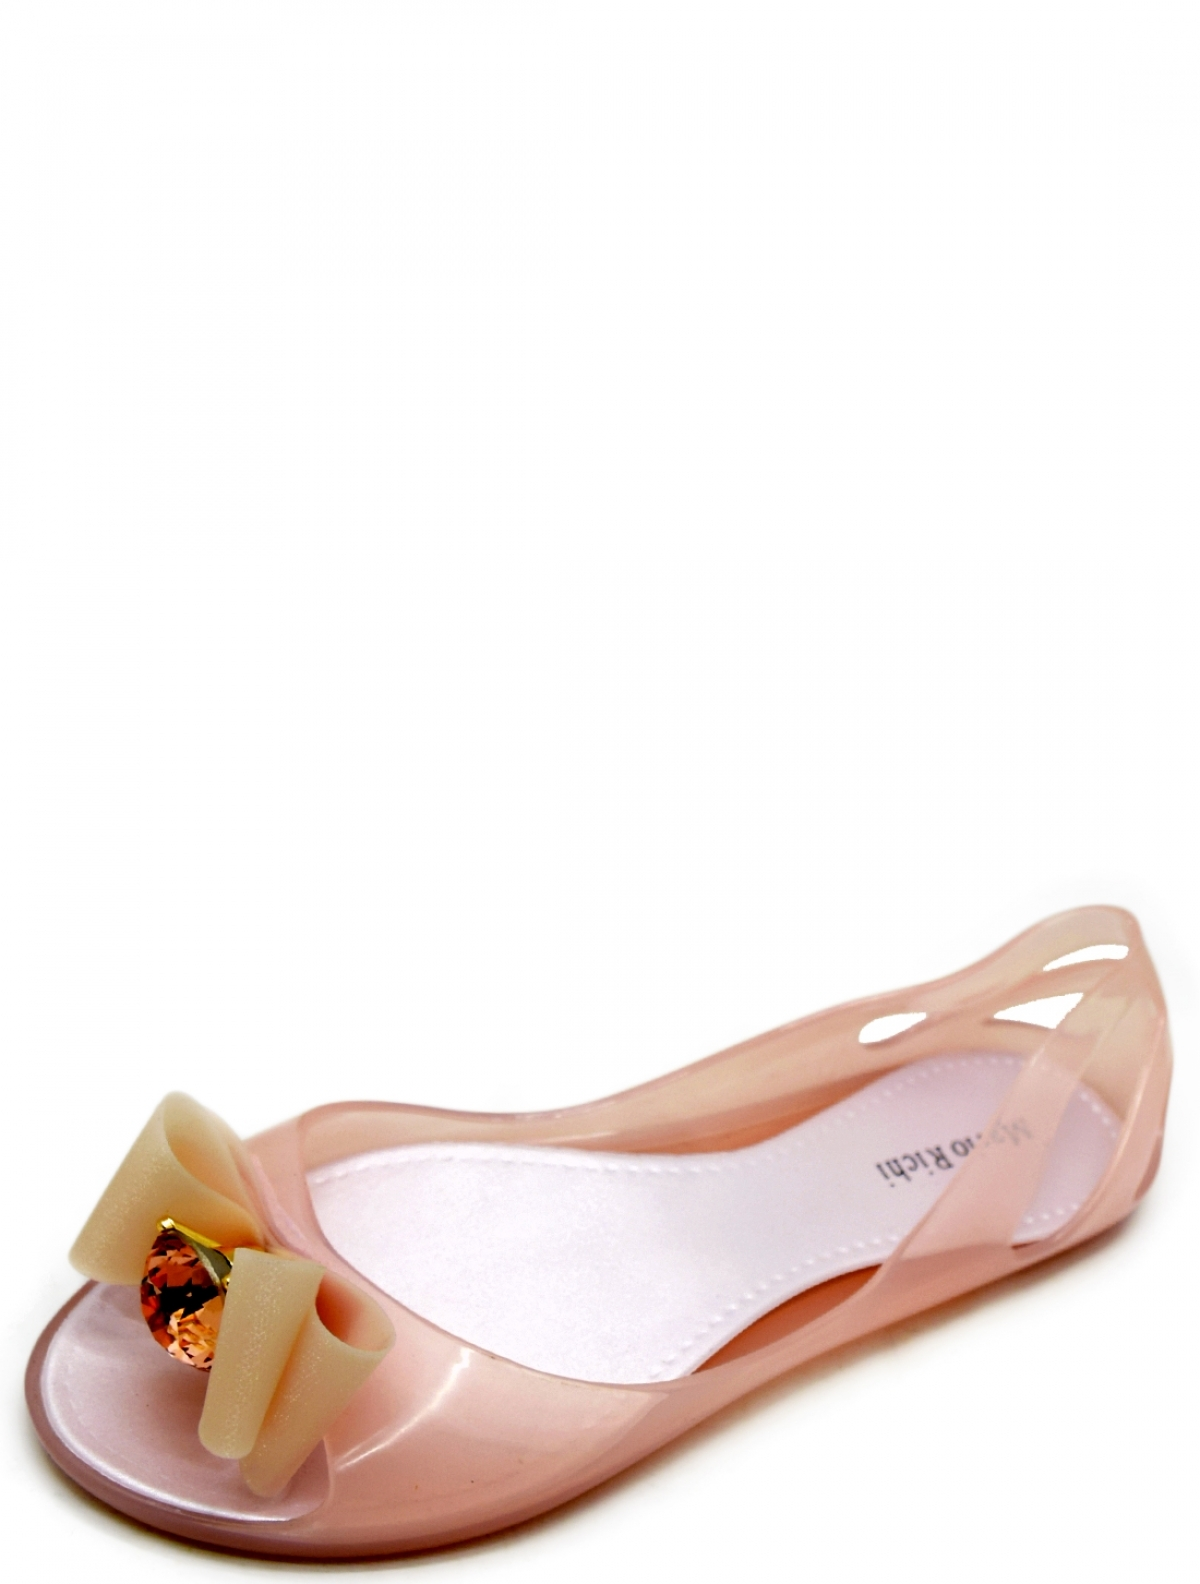 Mario Ricci H7-2-27 женские балетки